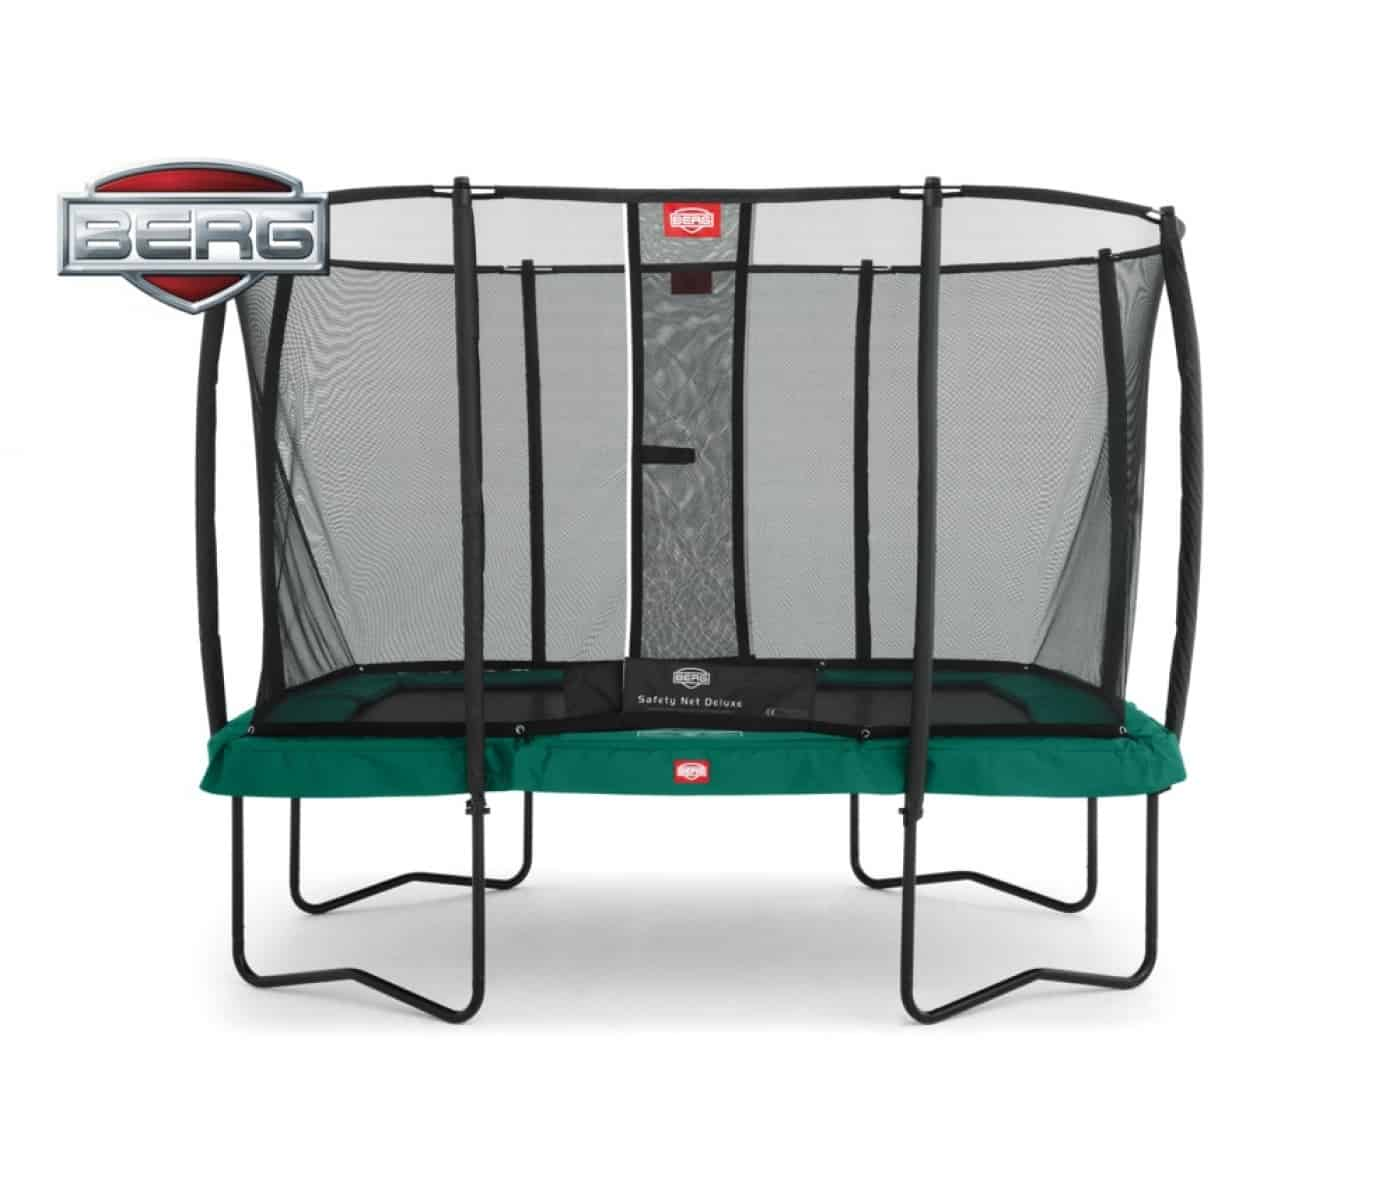 Berg eazyfit trampolin